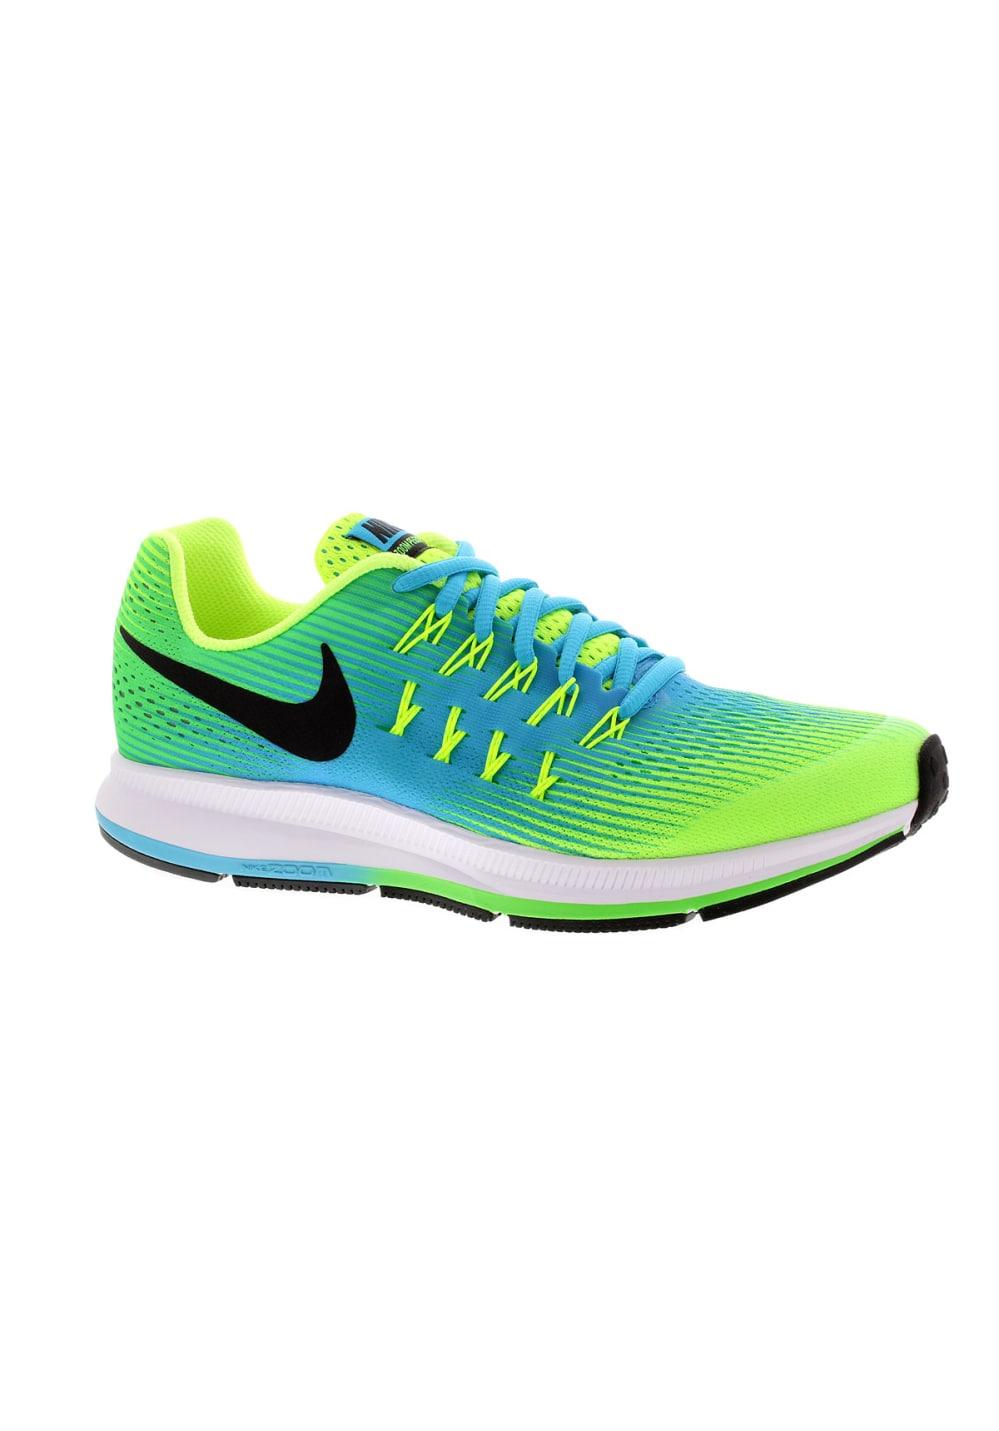 grande vente 147be 4c1ad Nike Air Zoom Pegasus 33 GS Boys - Chaussures running - Bleu